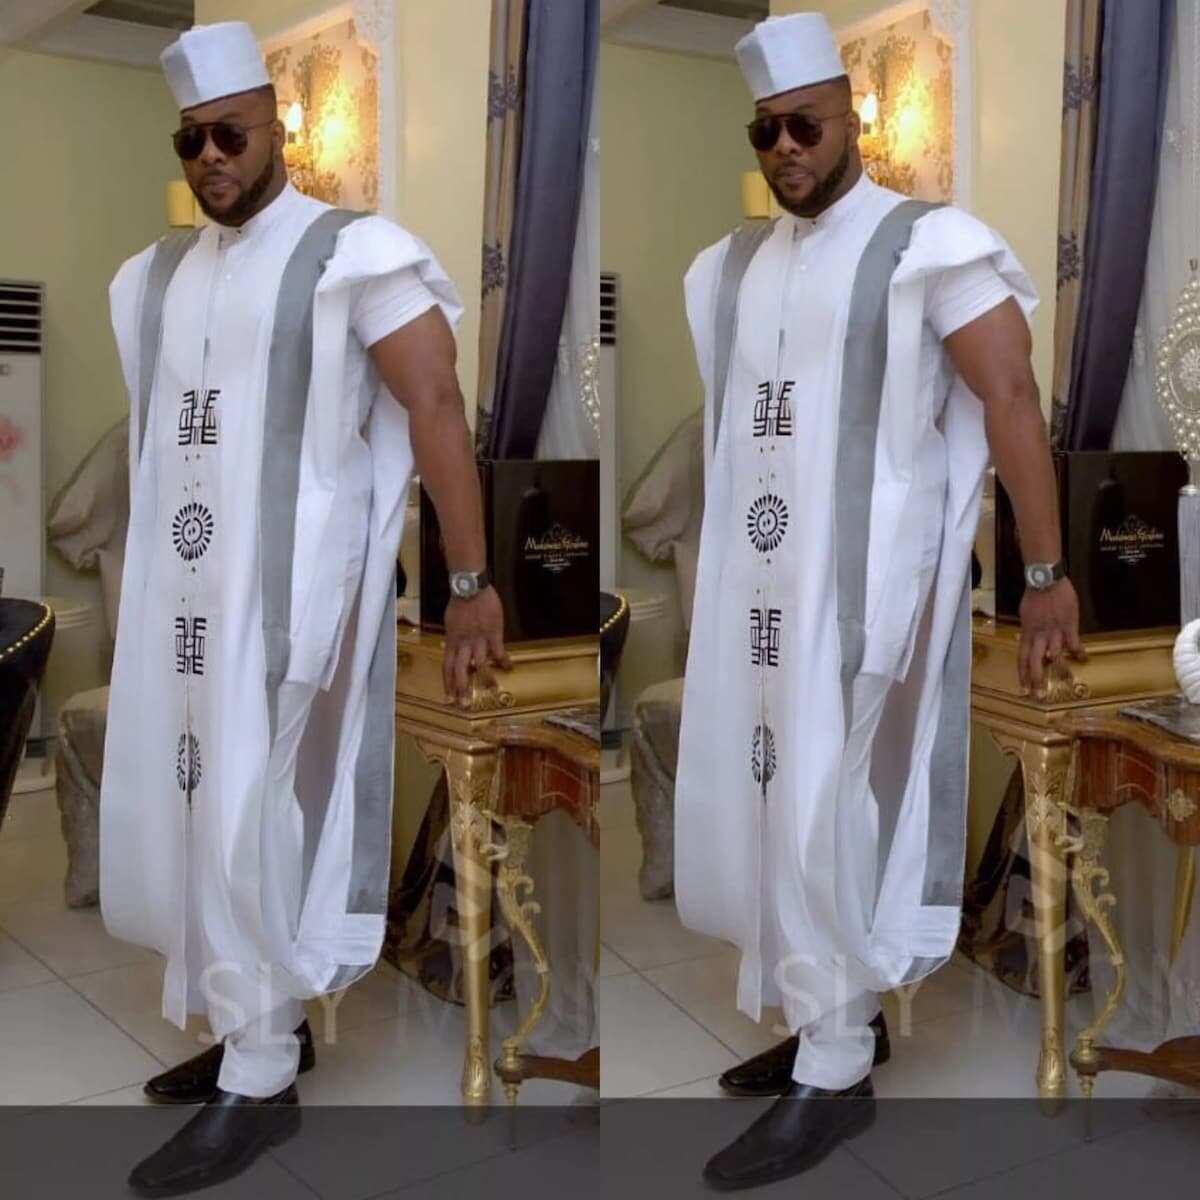 latest nigerian kaba styles, nigerian kaba styles, latest kaba styles in nigeria